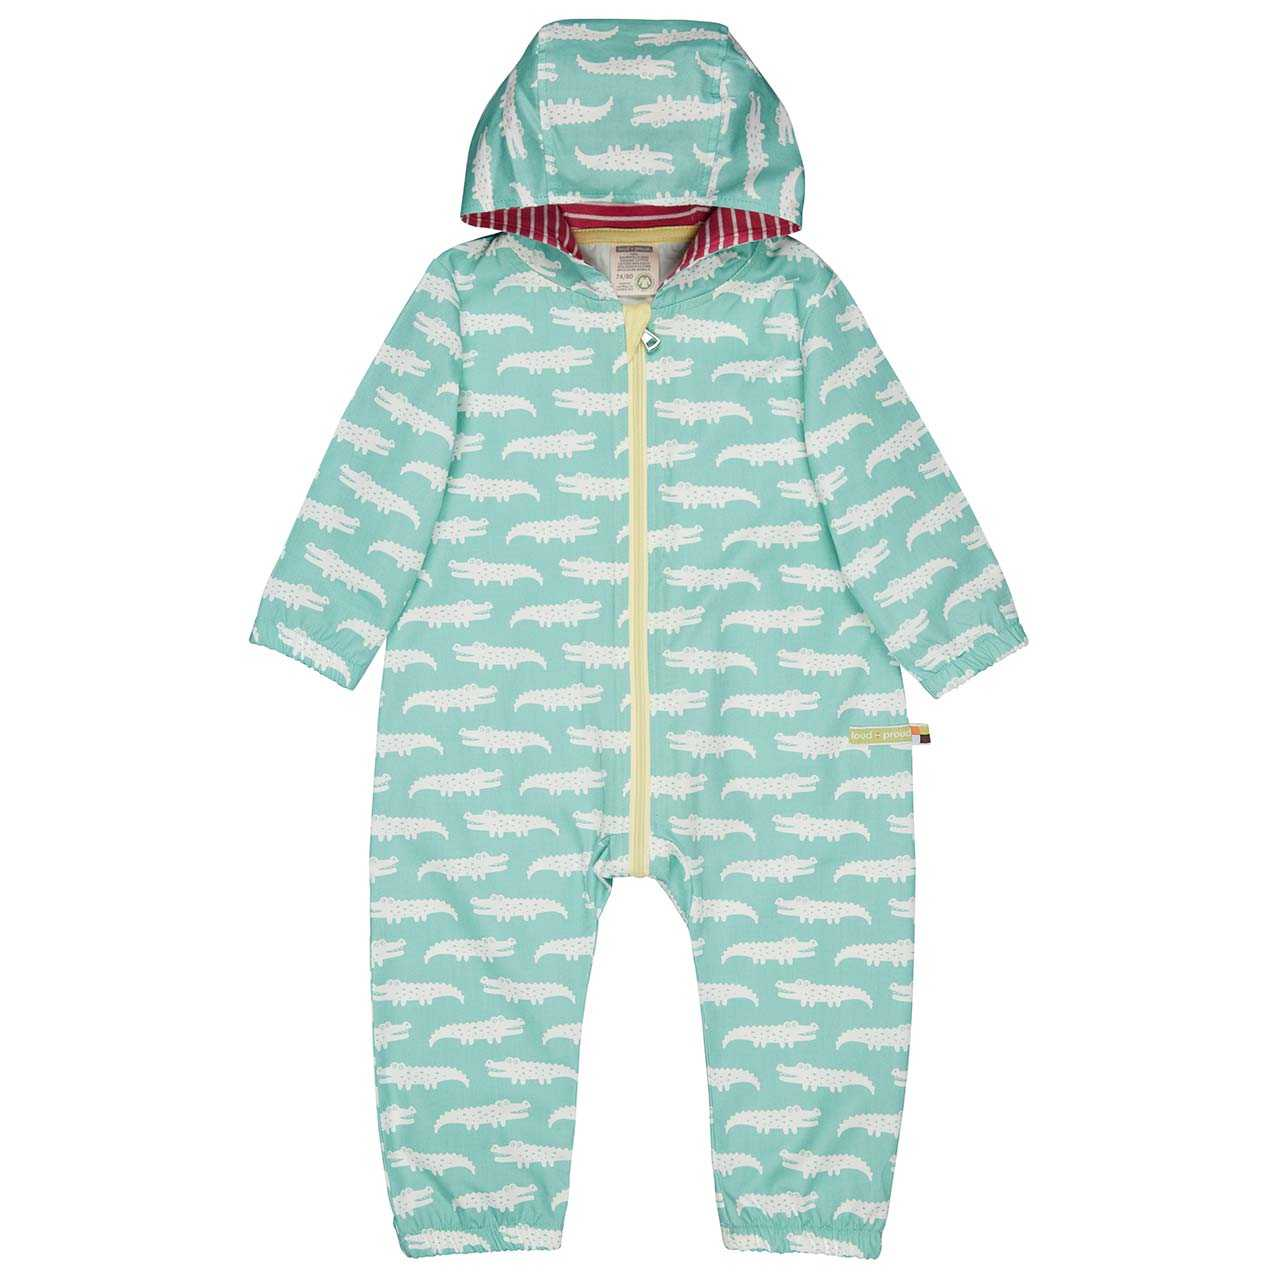 Mädchen Set NEU ♥ Strampler Overall Baby Schlafanzug /& Mütze Gr 56